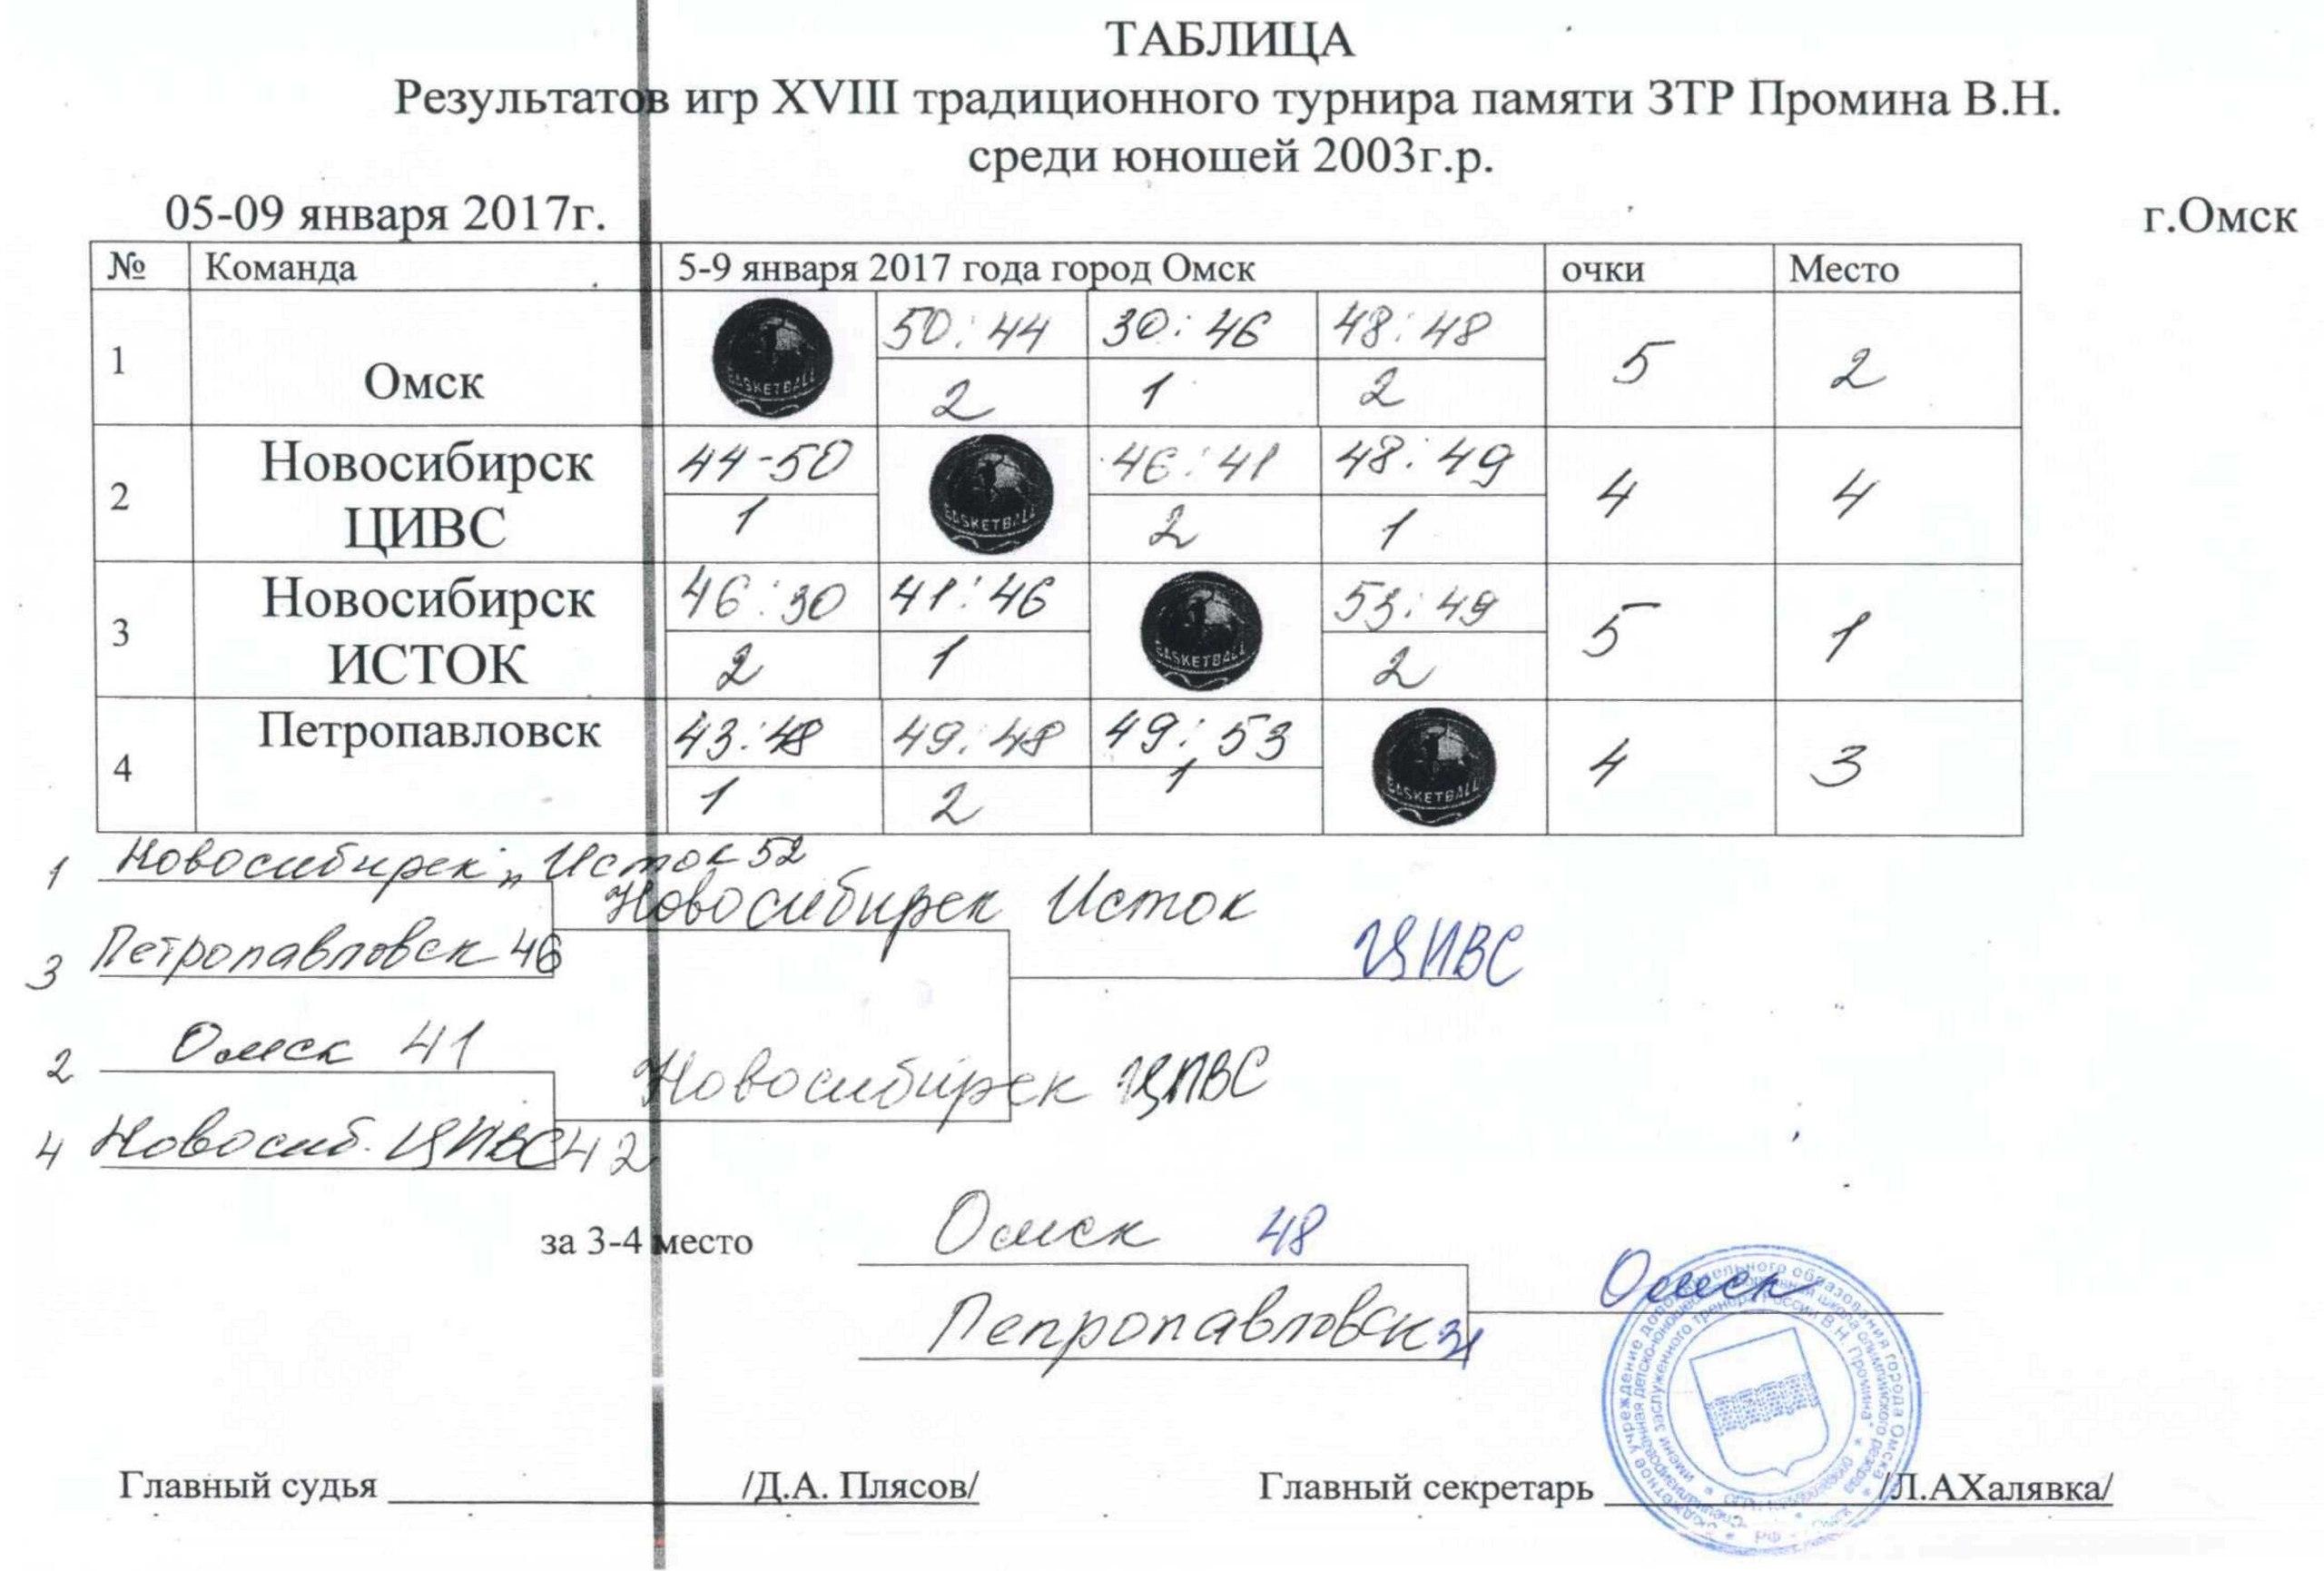 Таблица результатов 18-ого традиционного турнира по баскетболу памяти ЗТР В.Н. Промина.